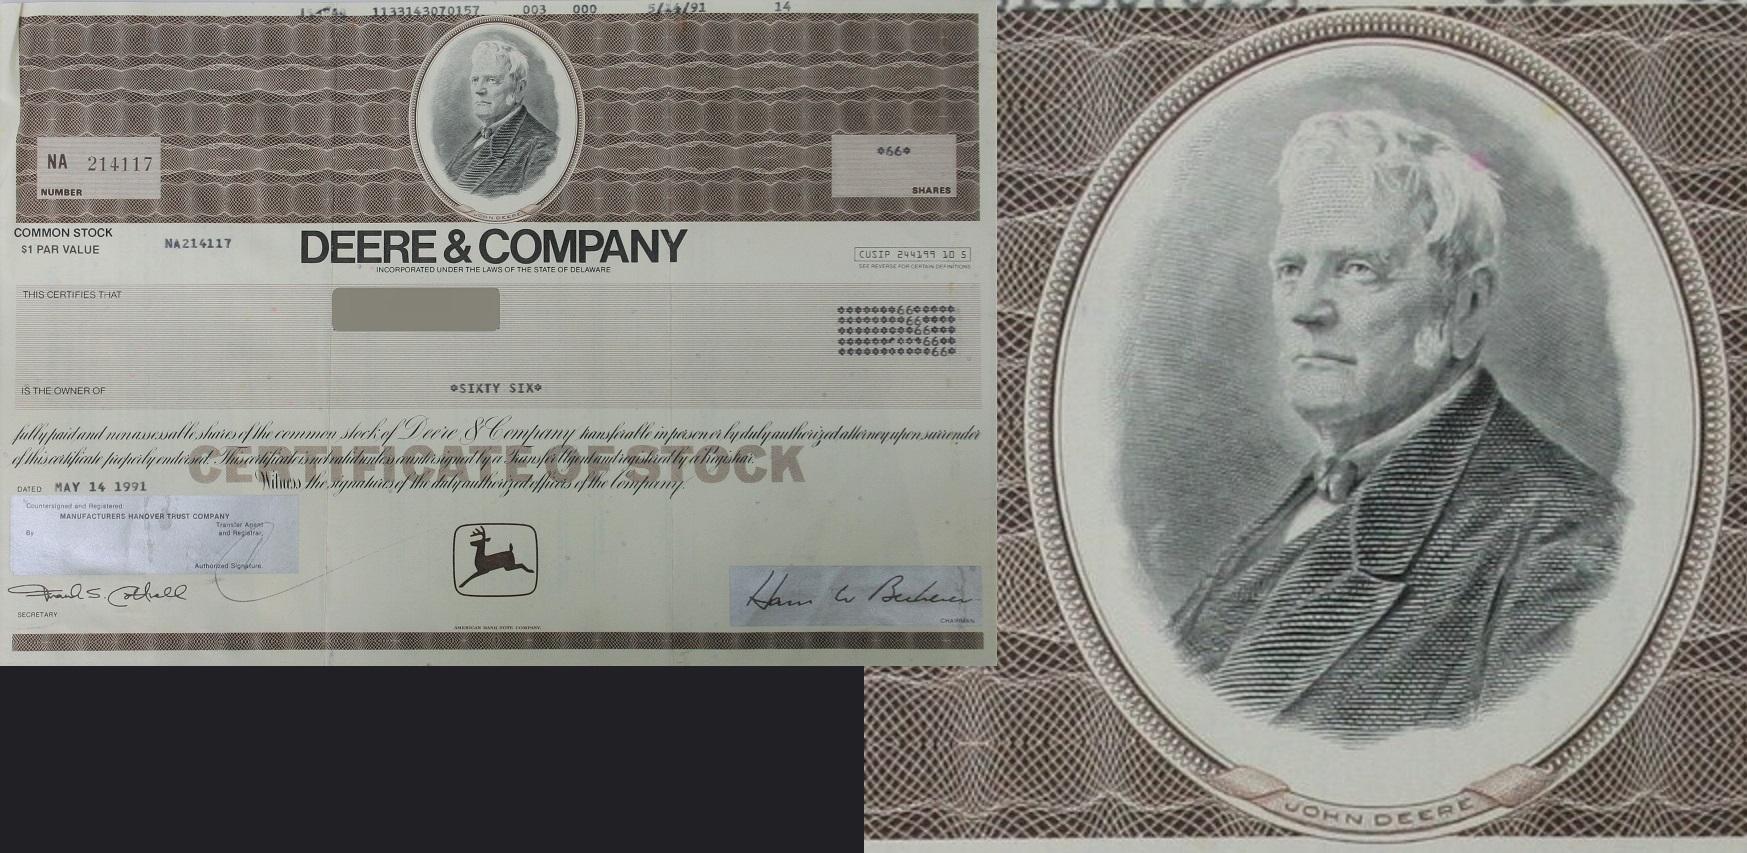 Shareholder certificate from Deere & Company